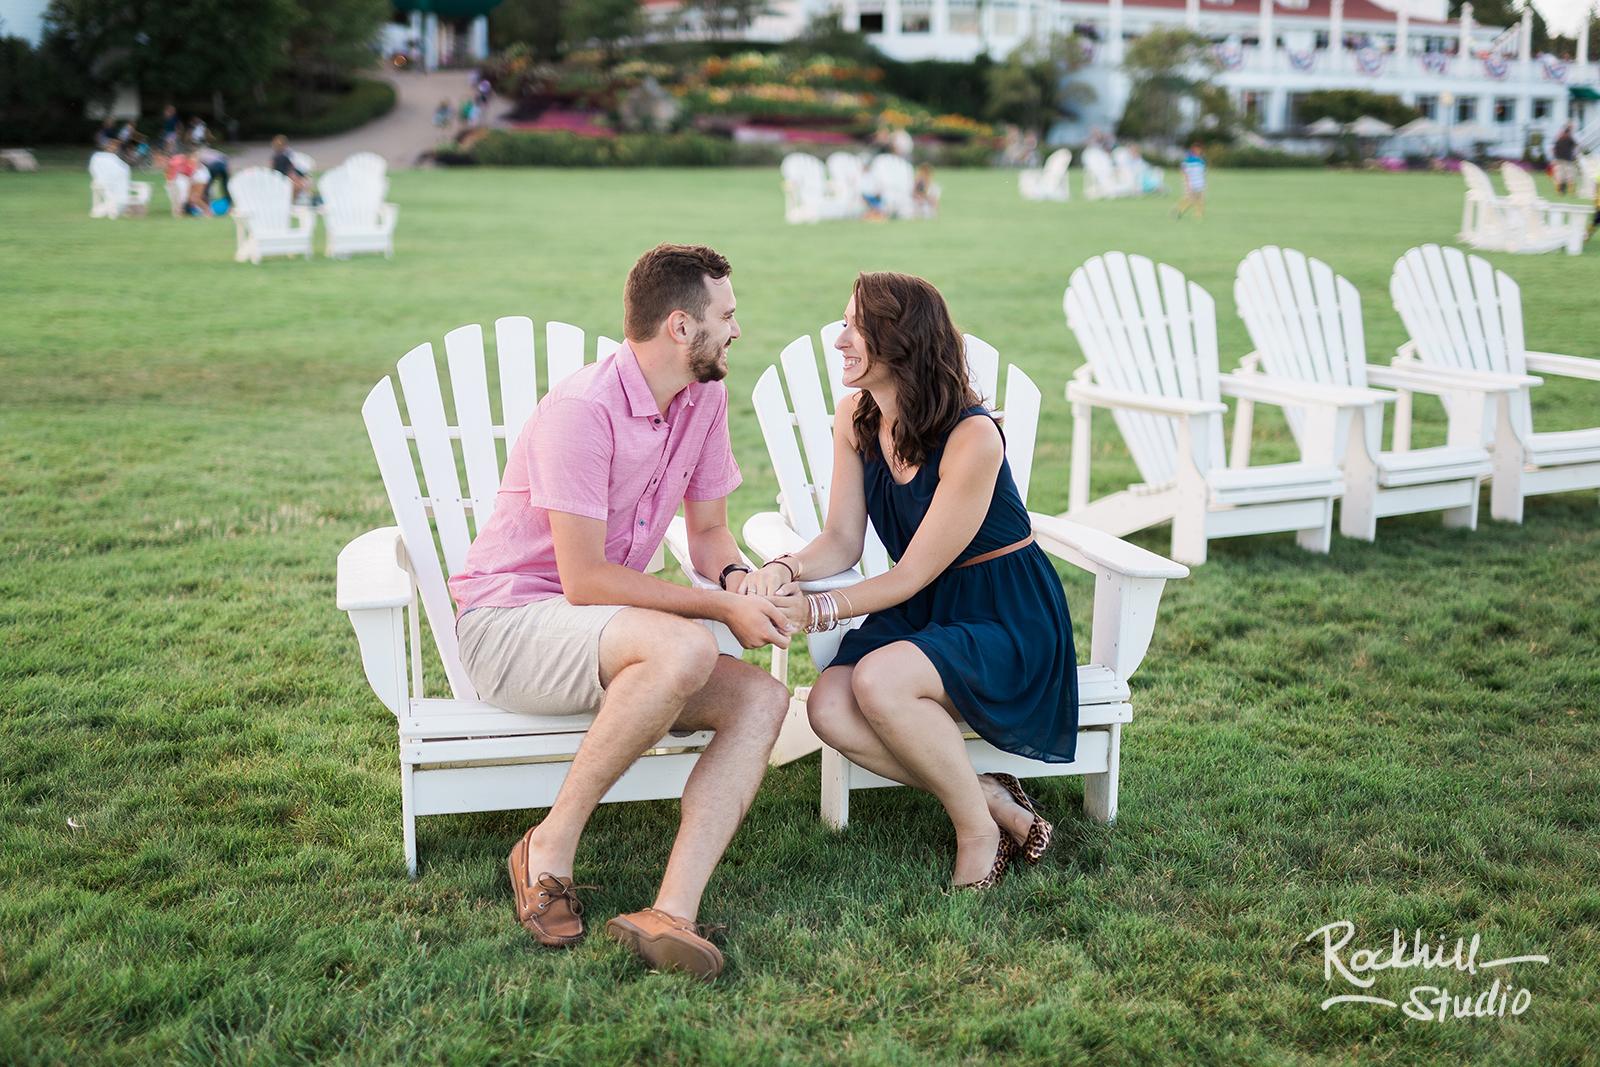 mackinac-island-wedding-engagement-northern-michigan-rockhill-studio-jt-34.jpg